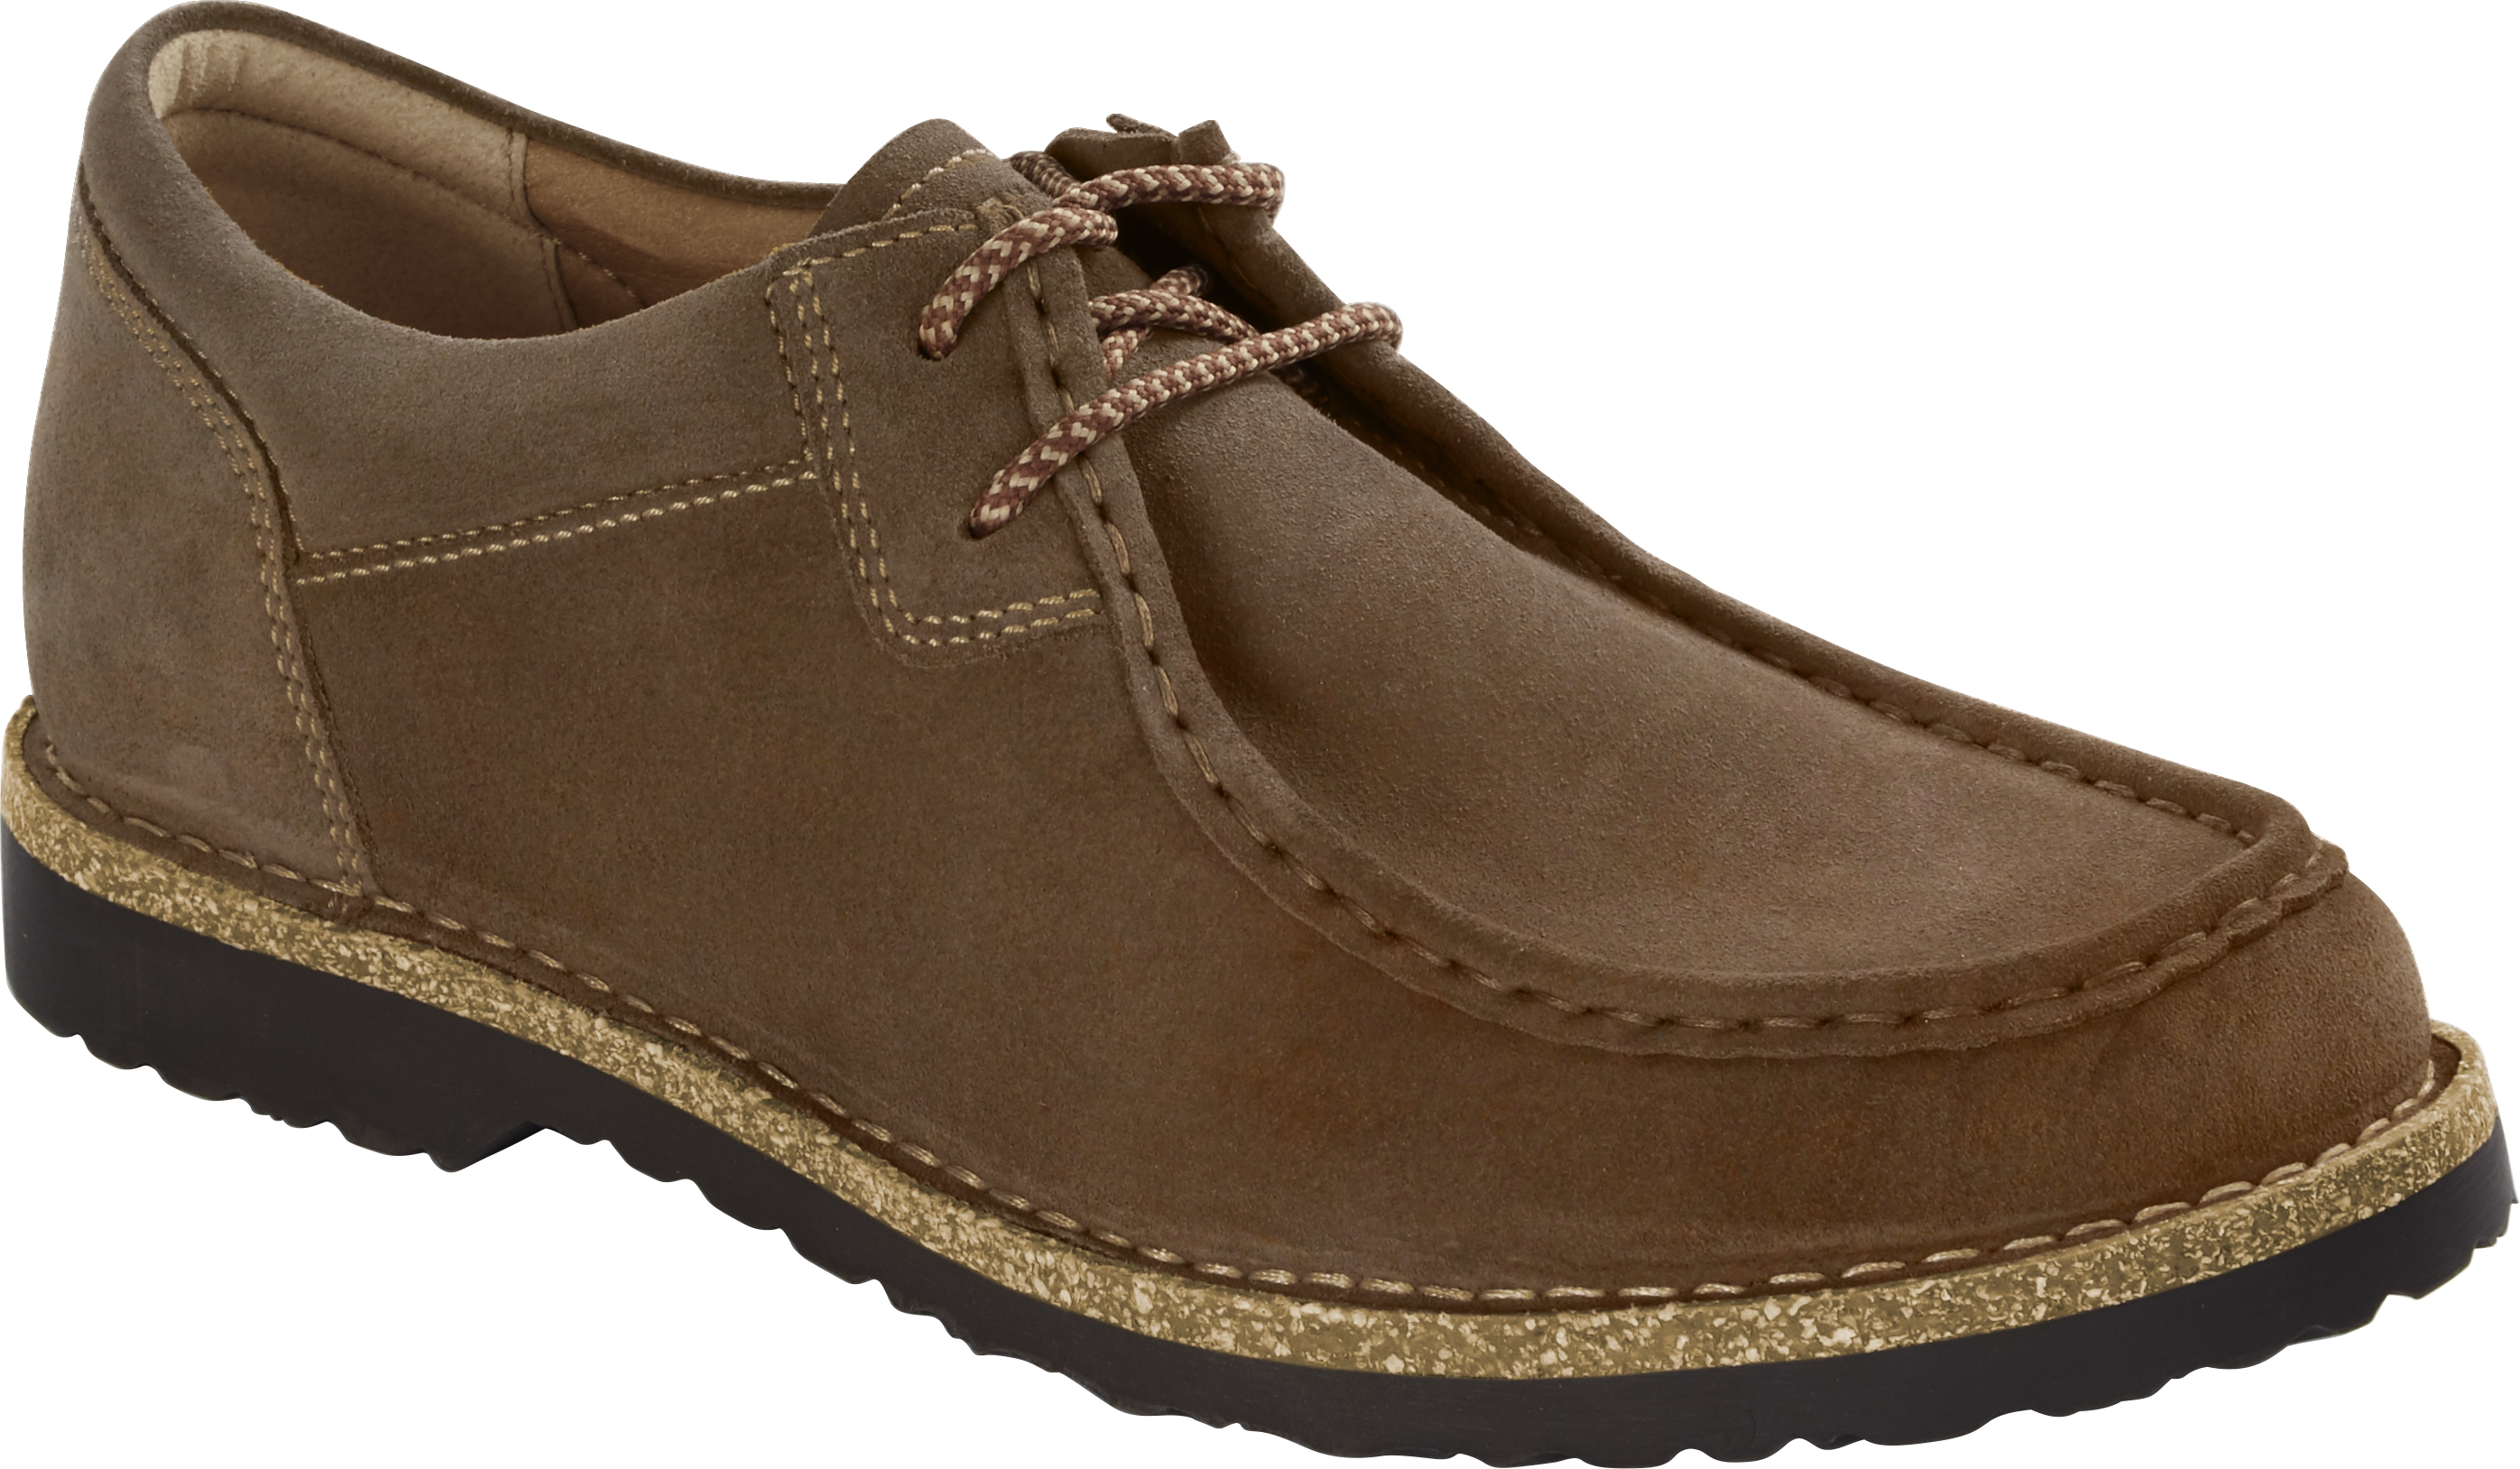 Birkenstock Shoes Boots Pasadena tea hydrophobic 1015018